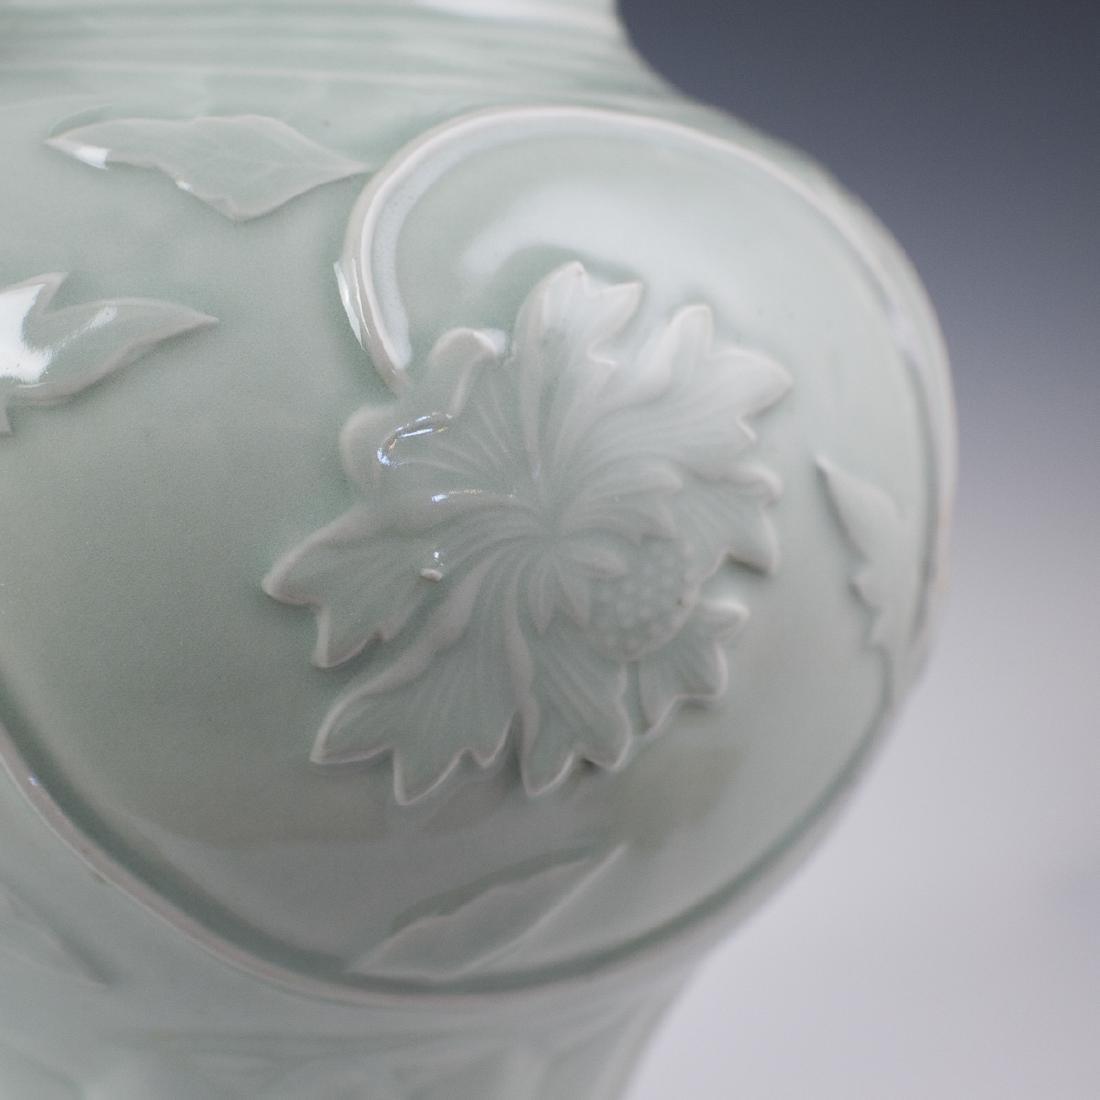 Chinese Celadon Ceramic Fengweizun Vases - 6